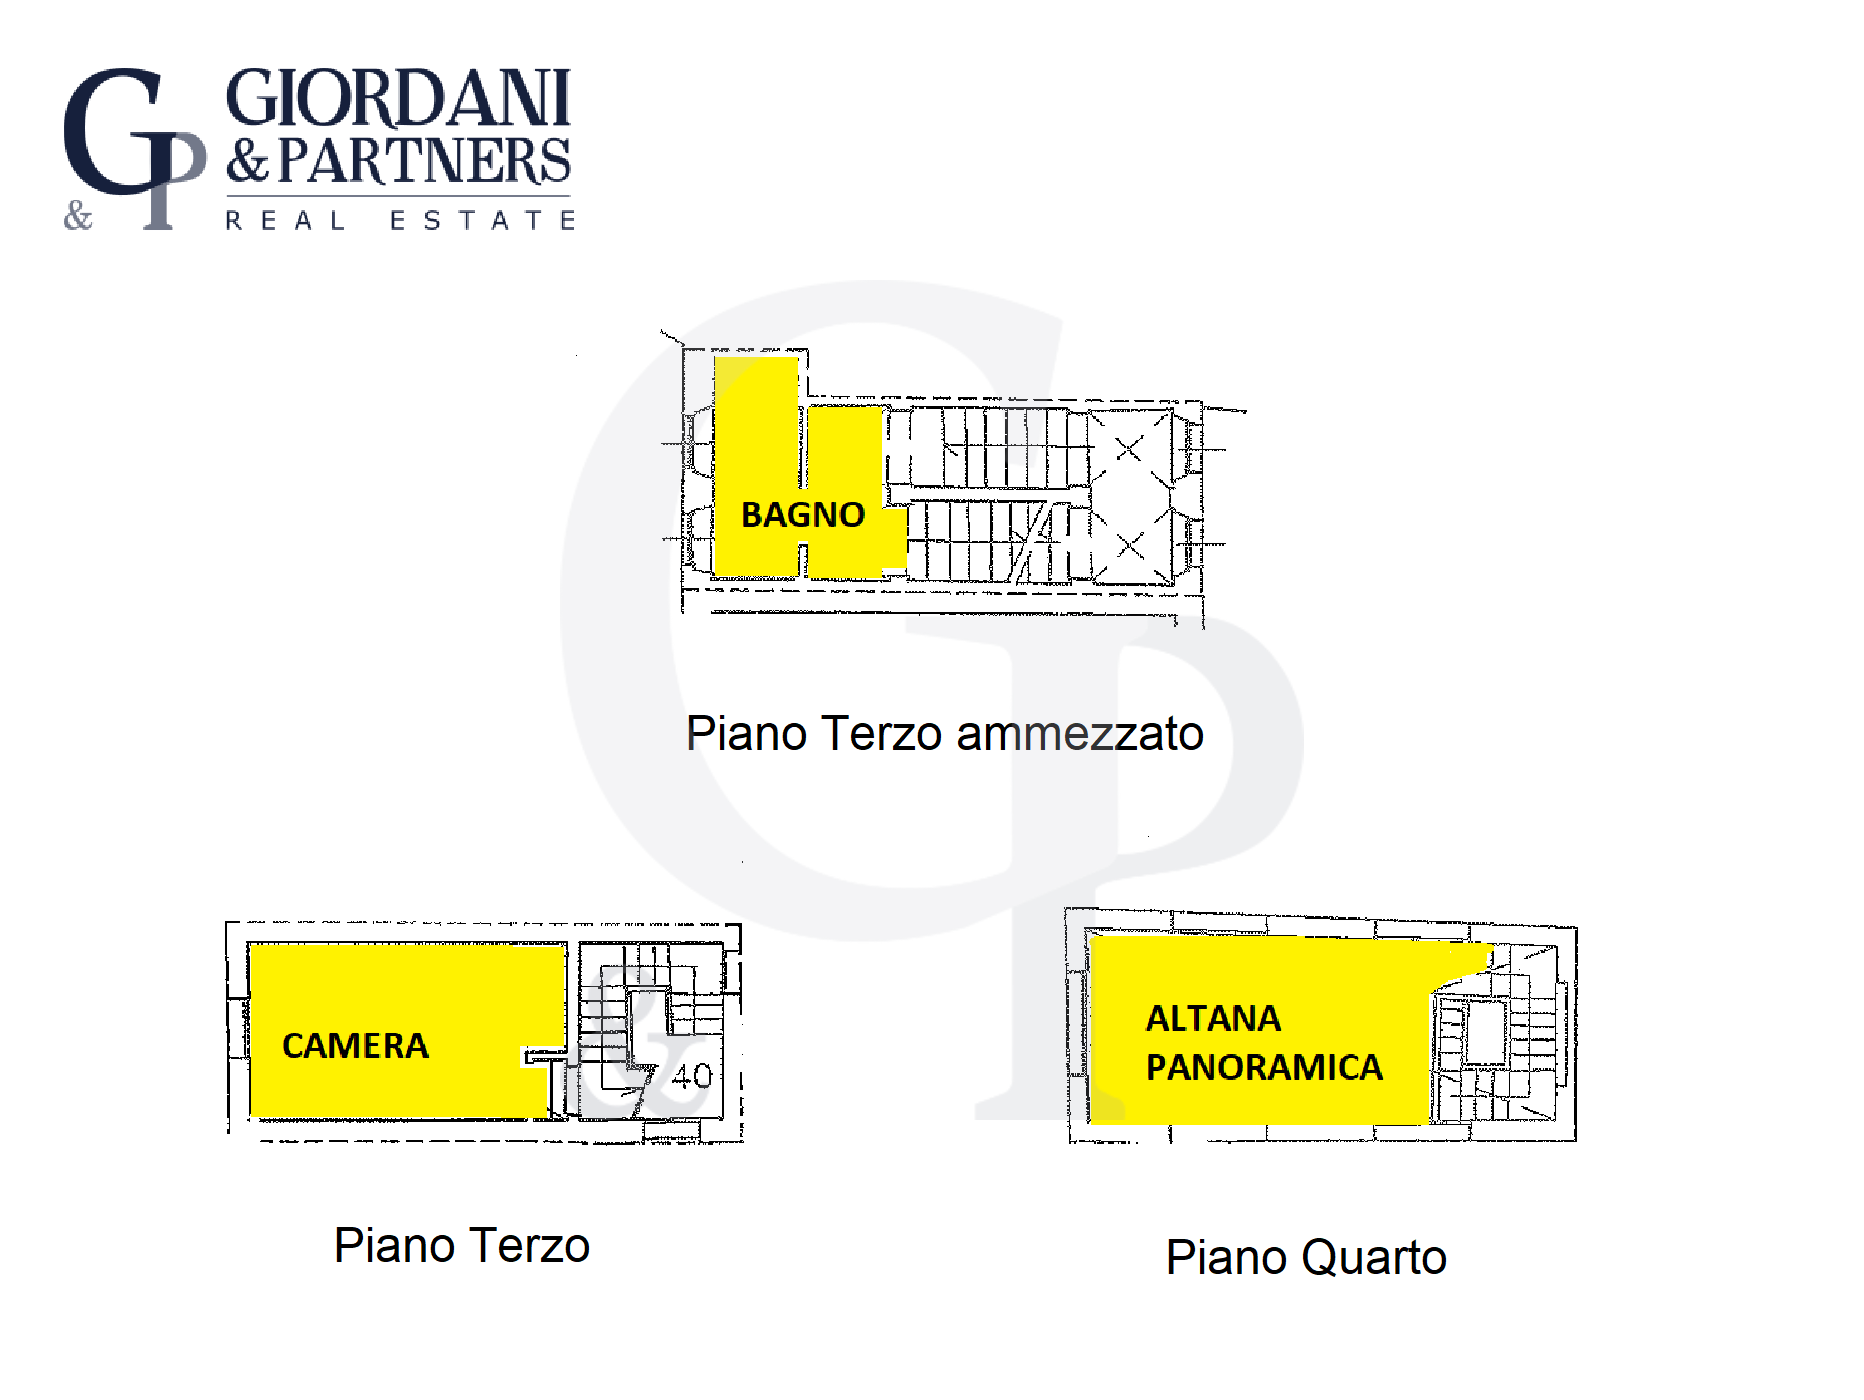 Piani Terzo ammezzato, Terzo e Quarto